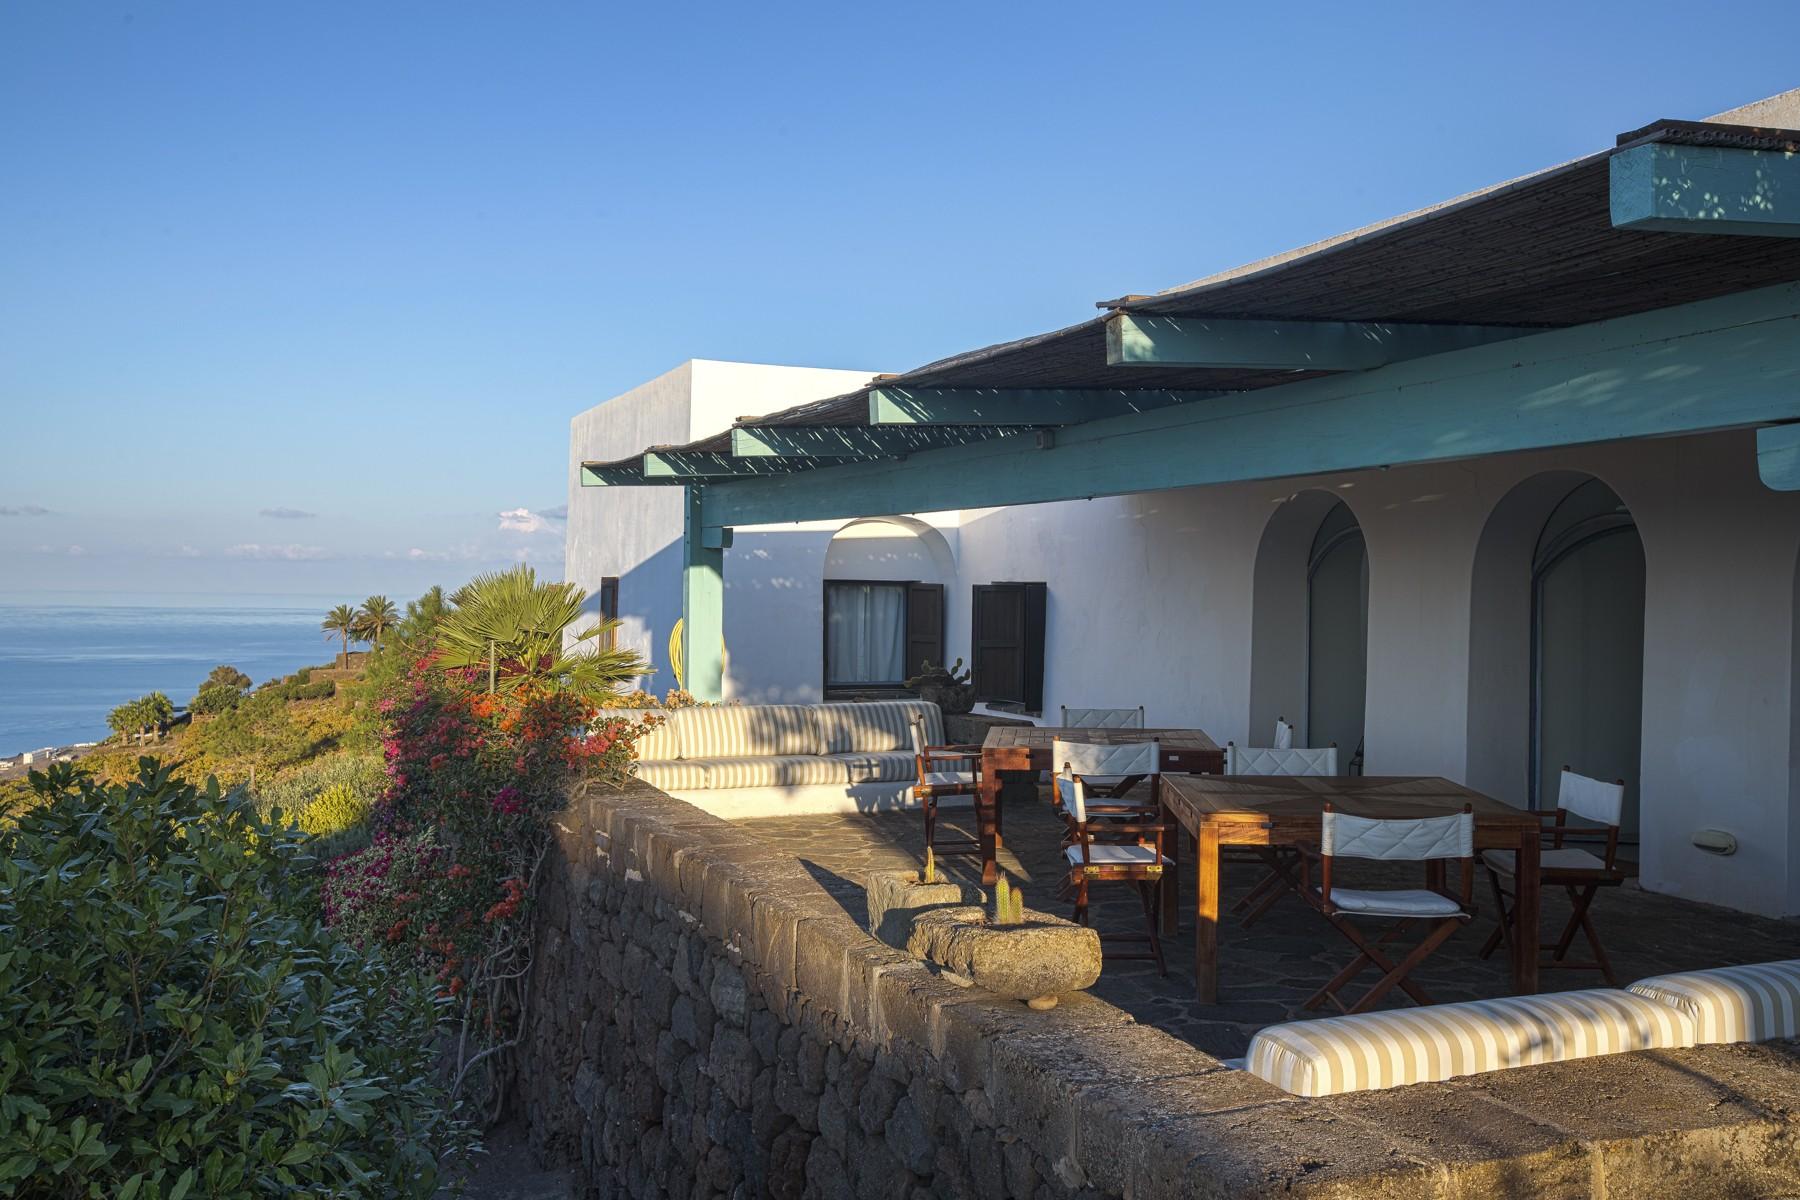 Villa in Vendita a Pantelleria: 5 locali, 530 mq - Foto 21